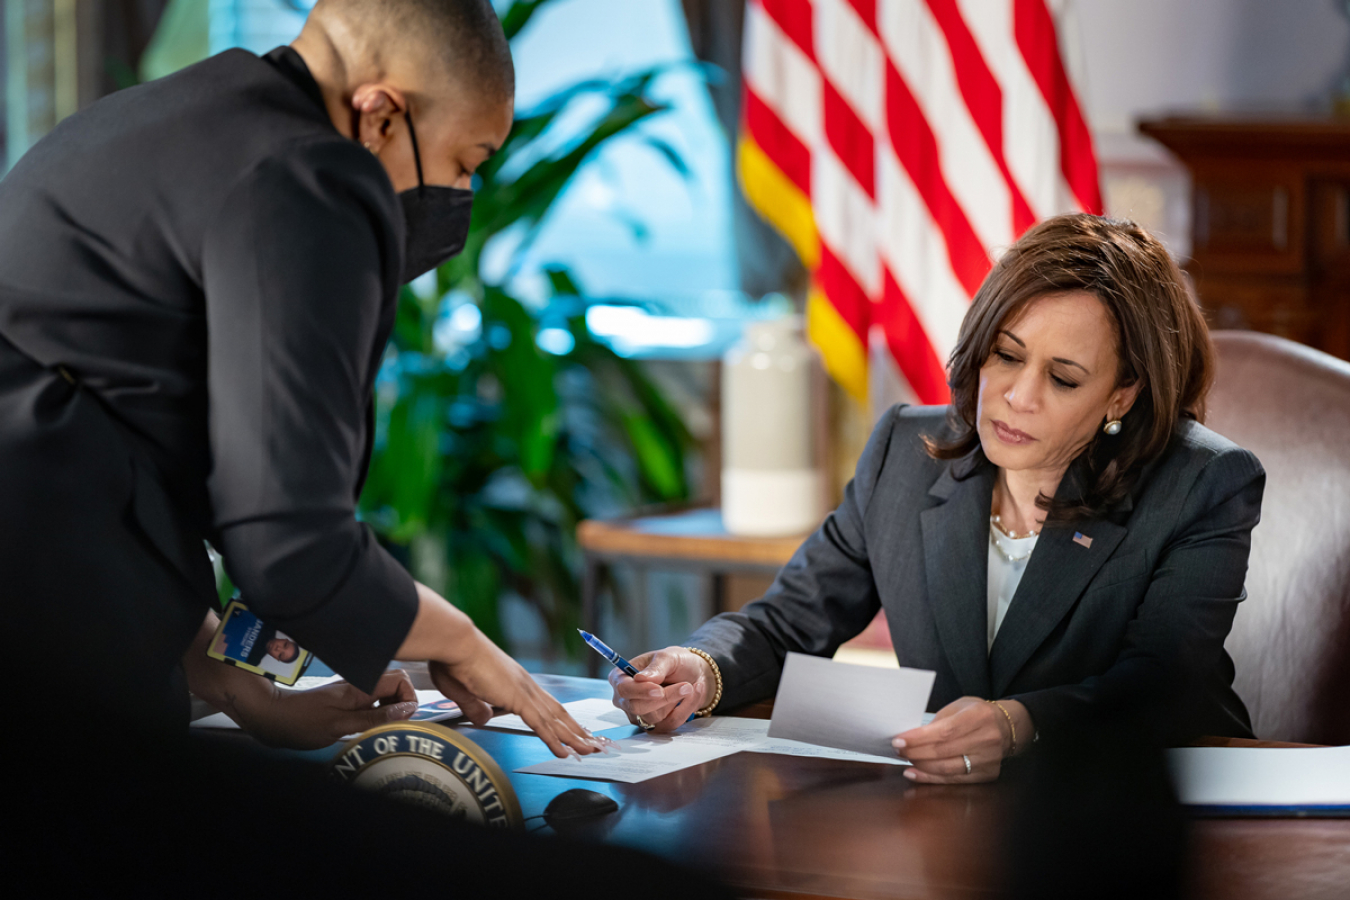 Vice President, Kamala Harris